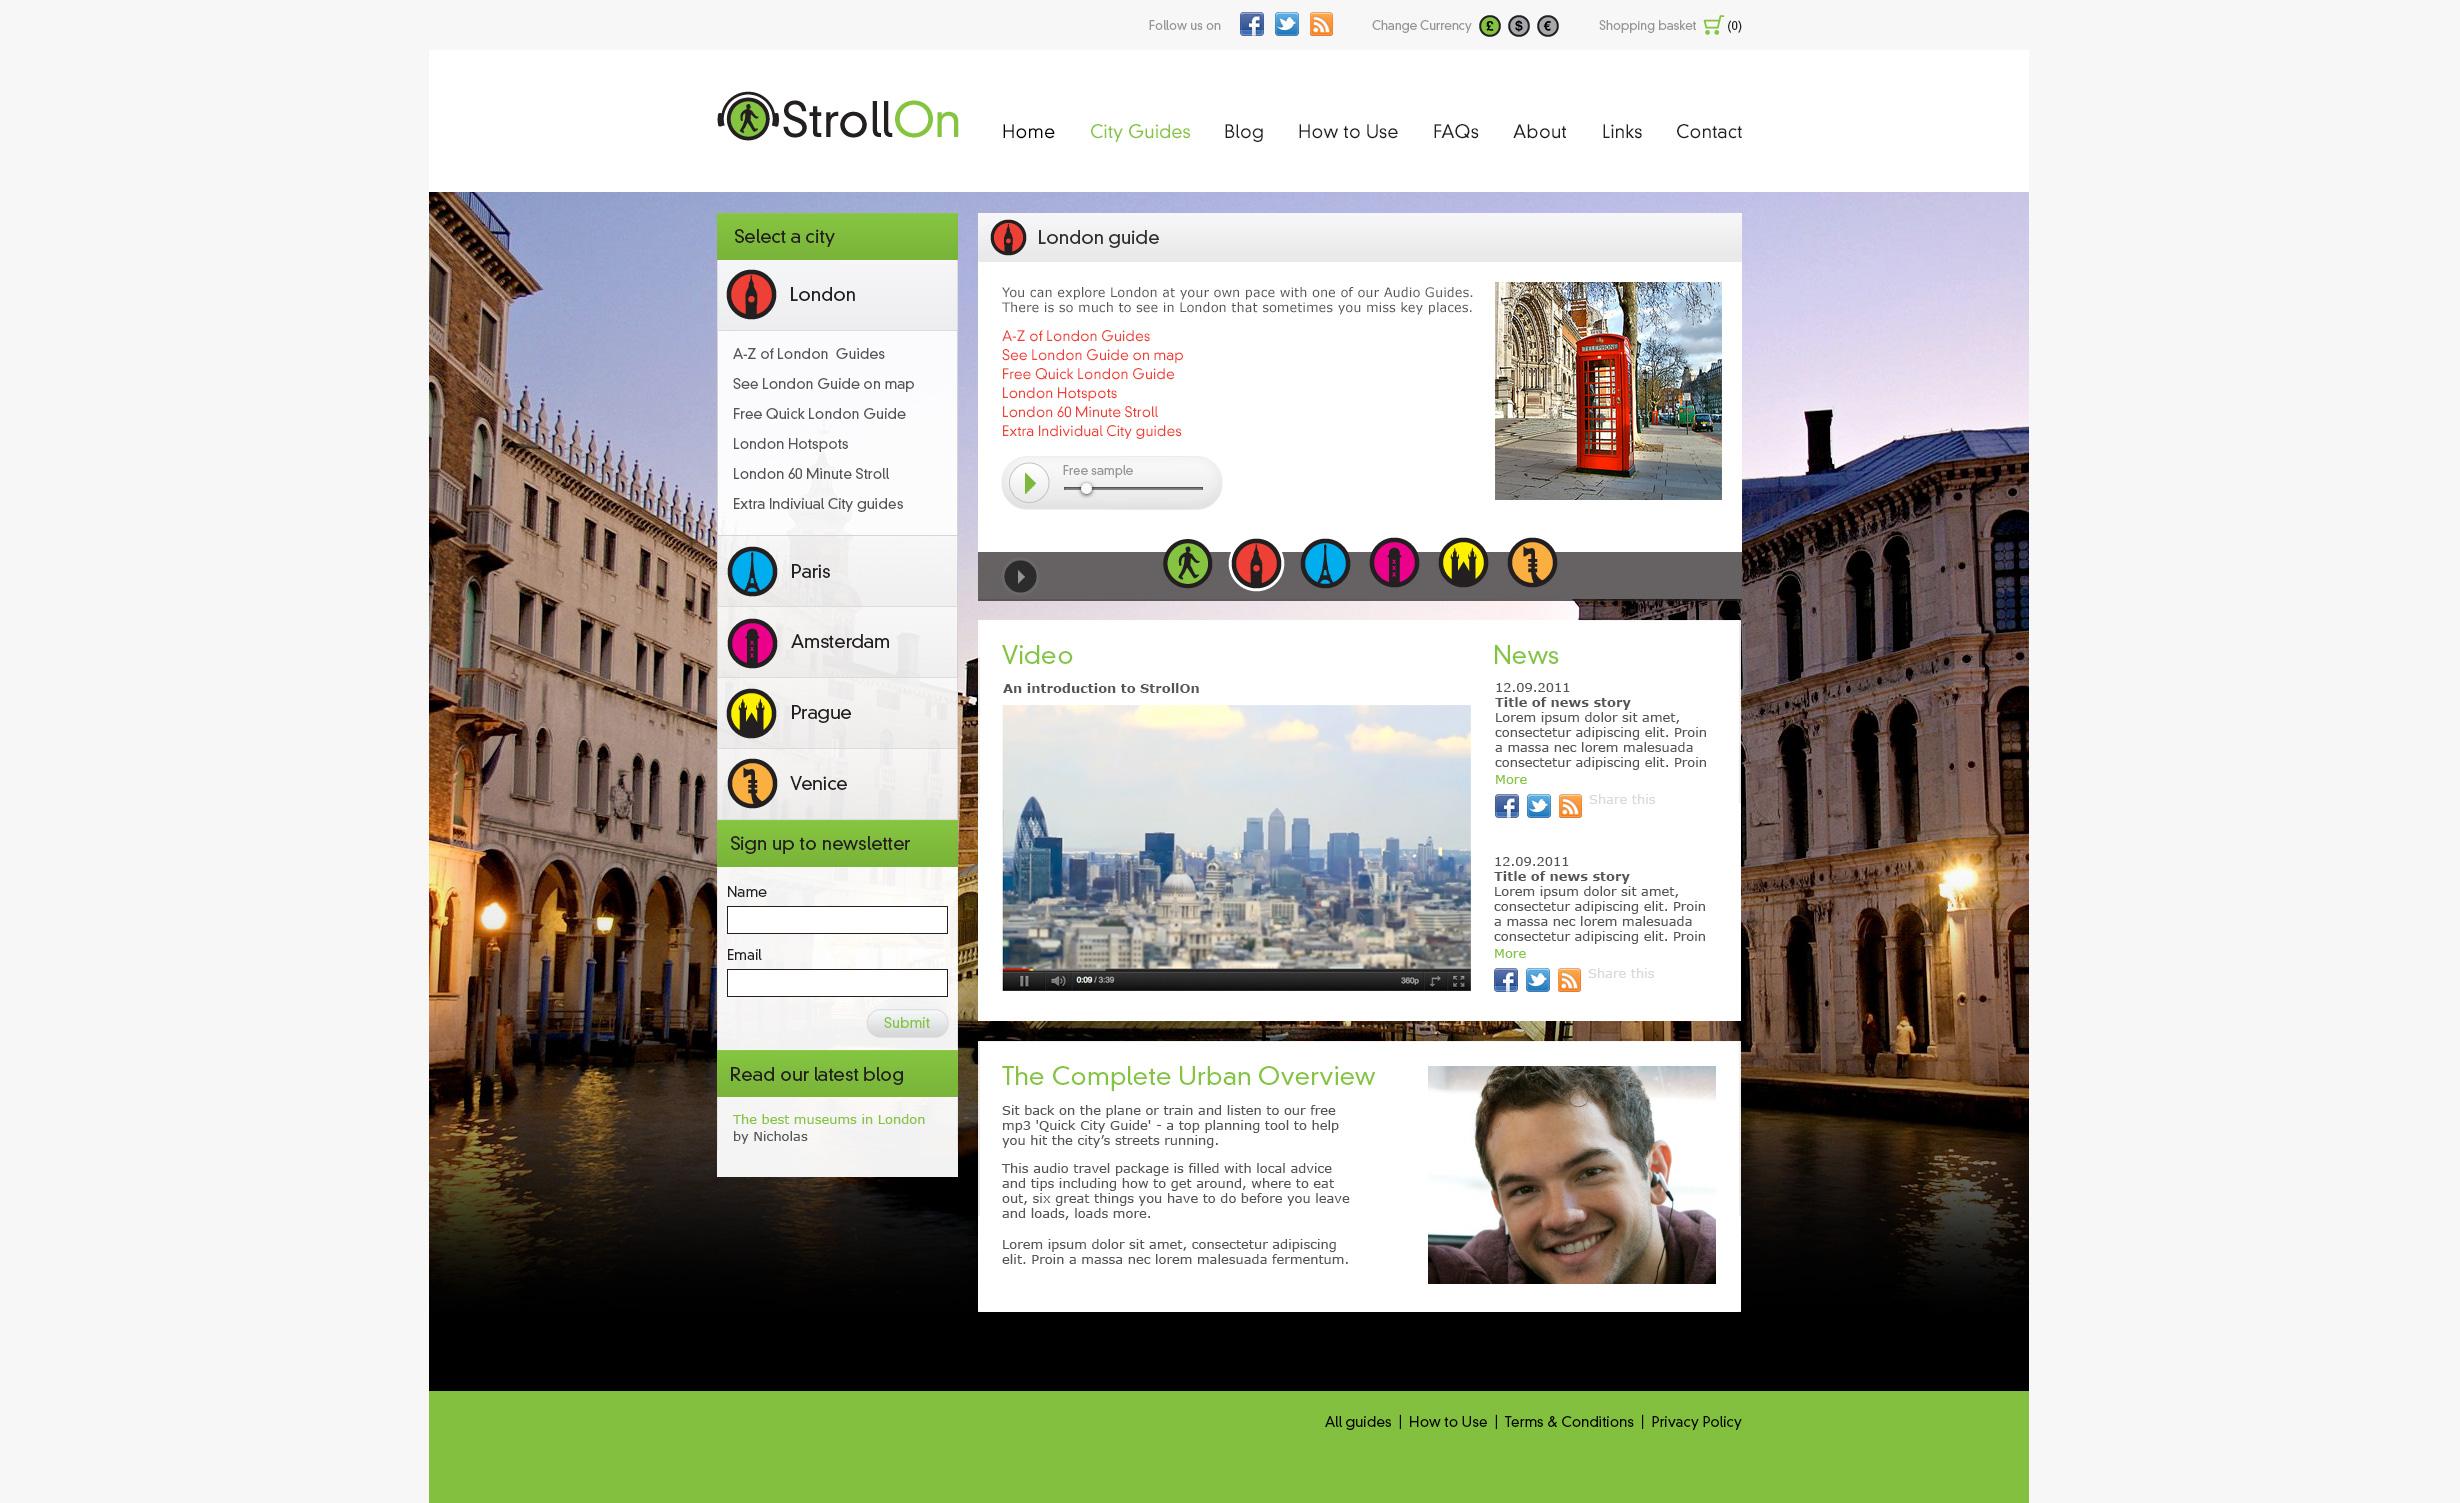 StrollOn website